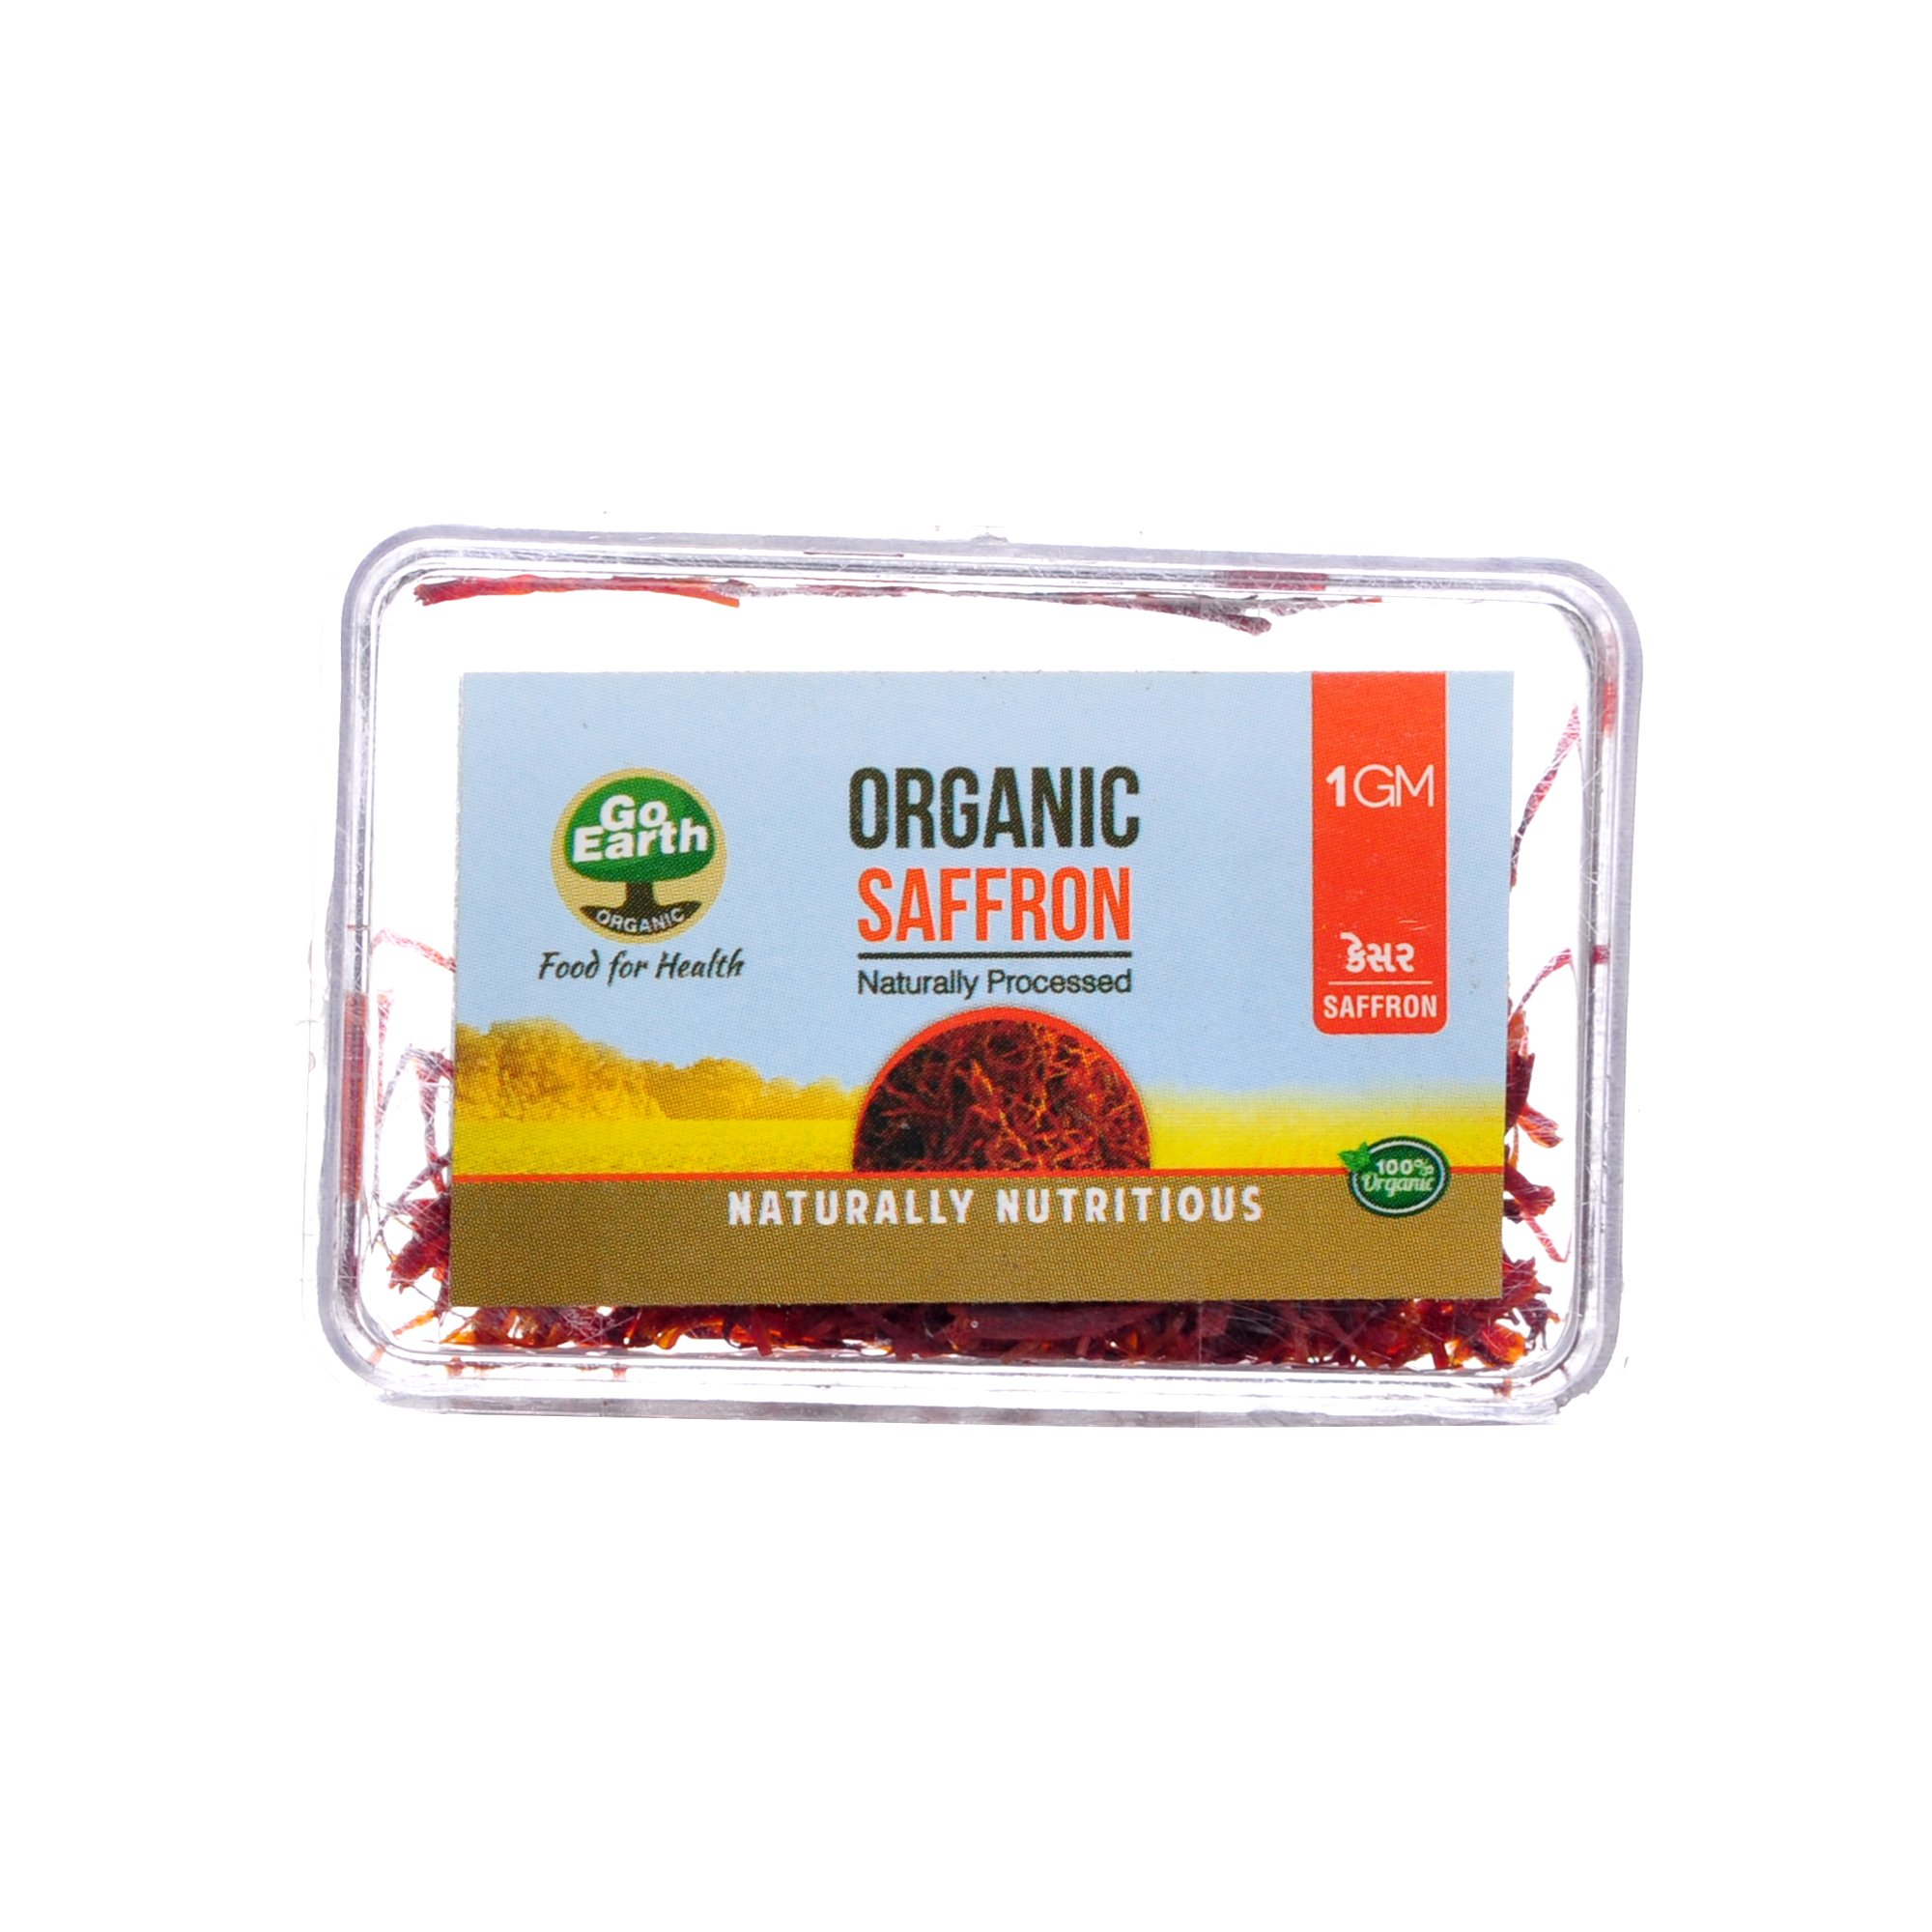 Go Earth Organic Saffron (Kesar ) Naturally Processed 1g